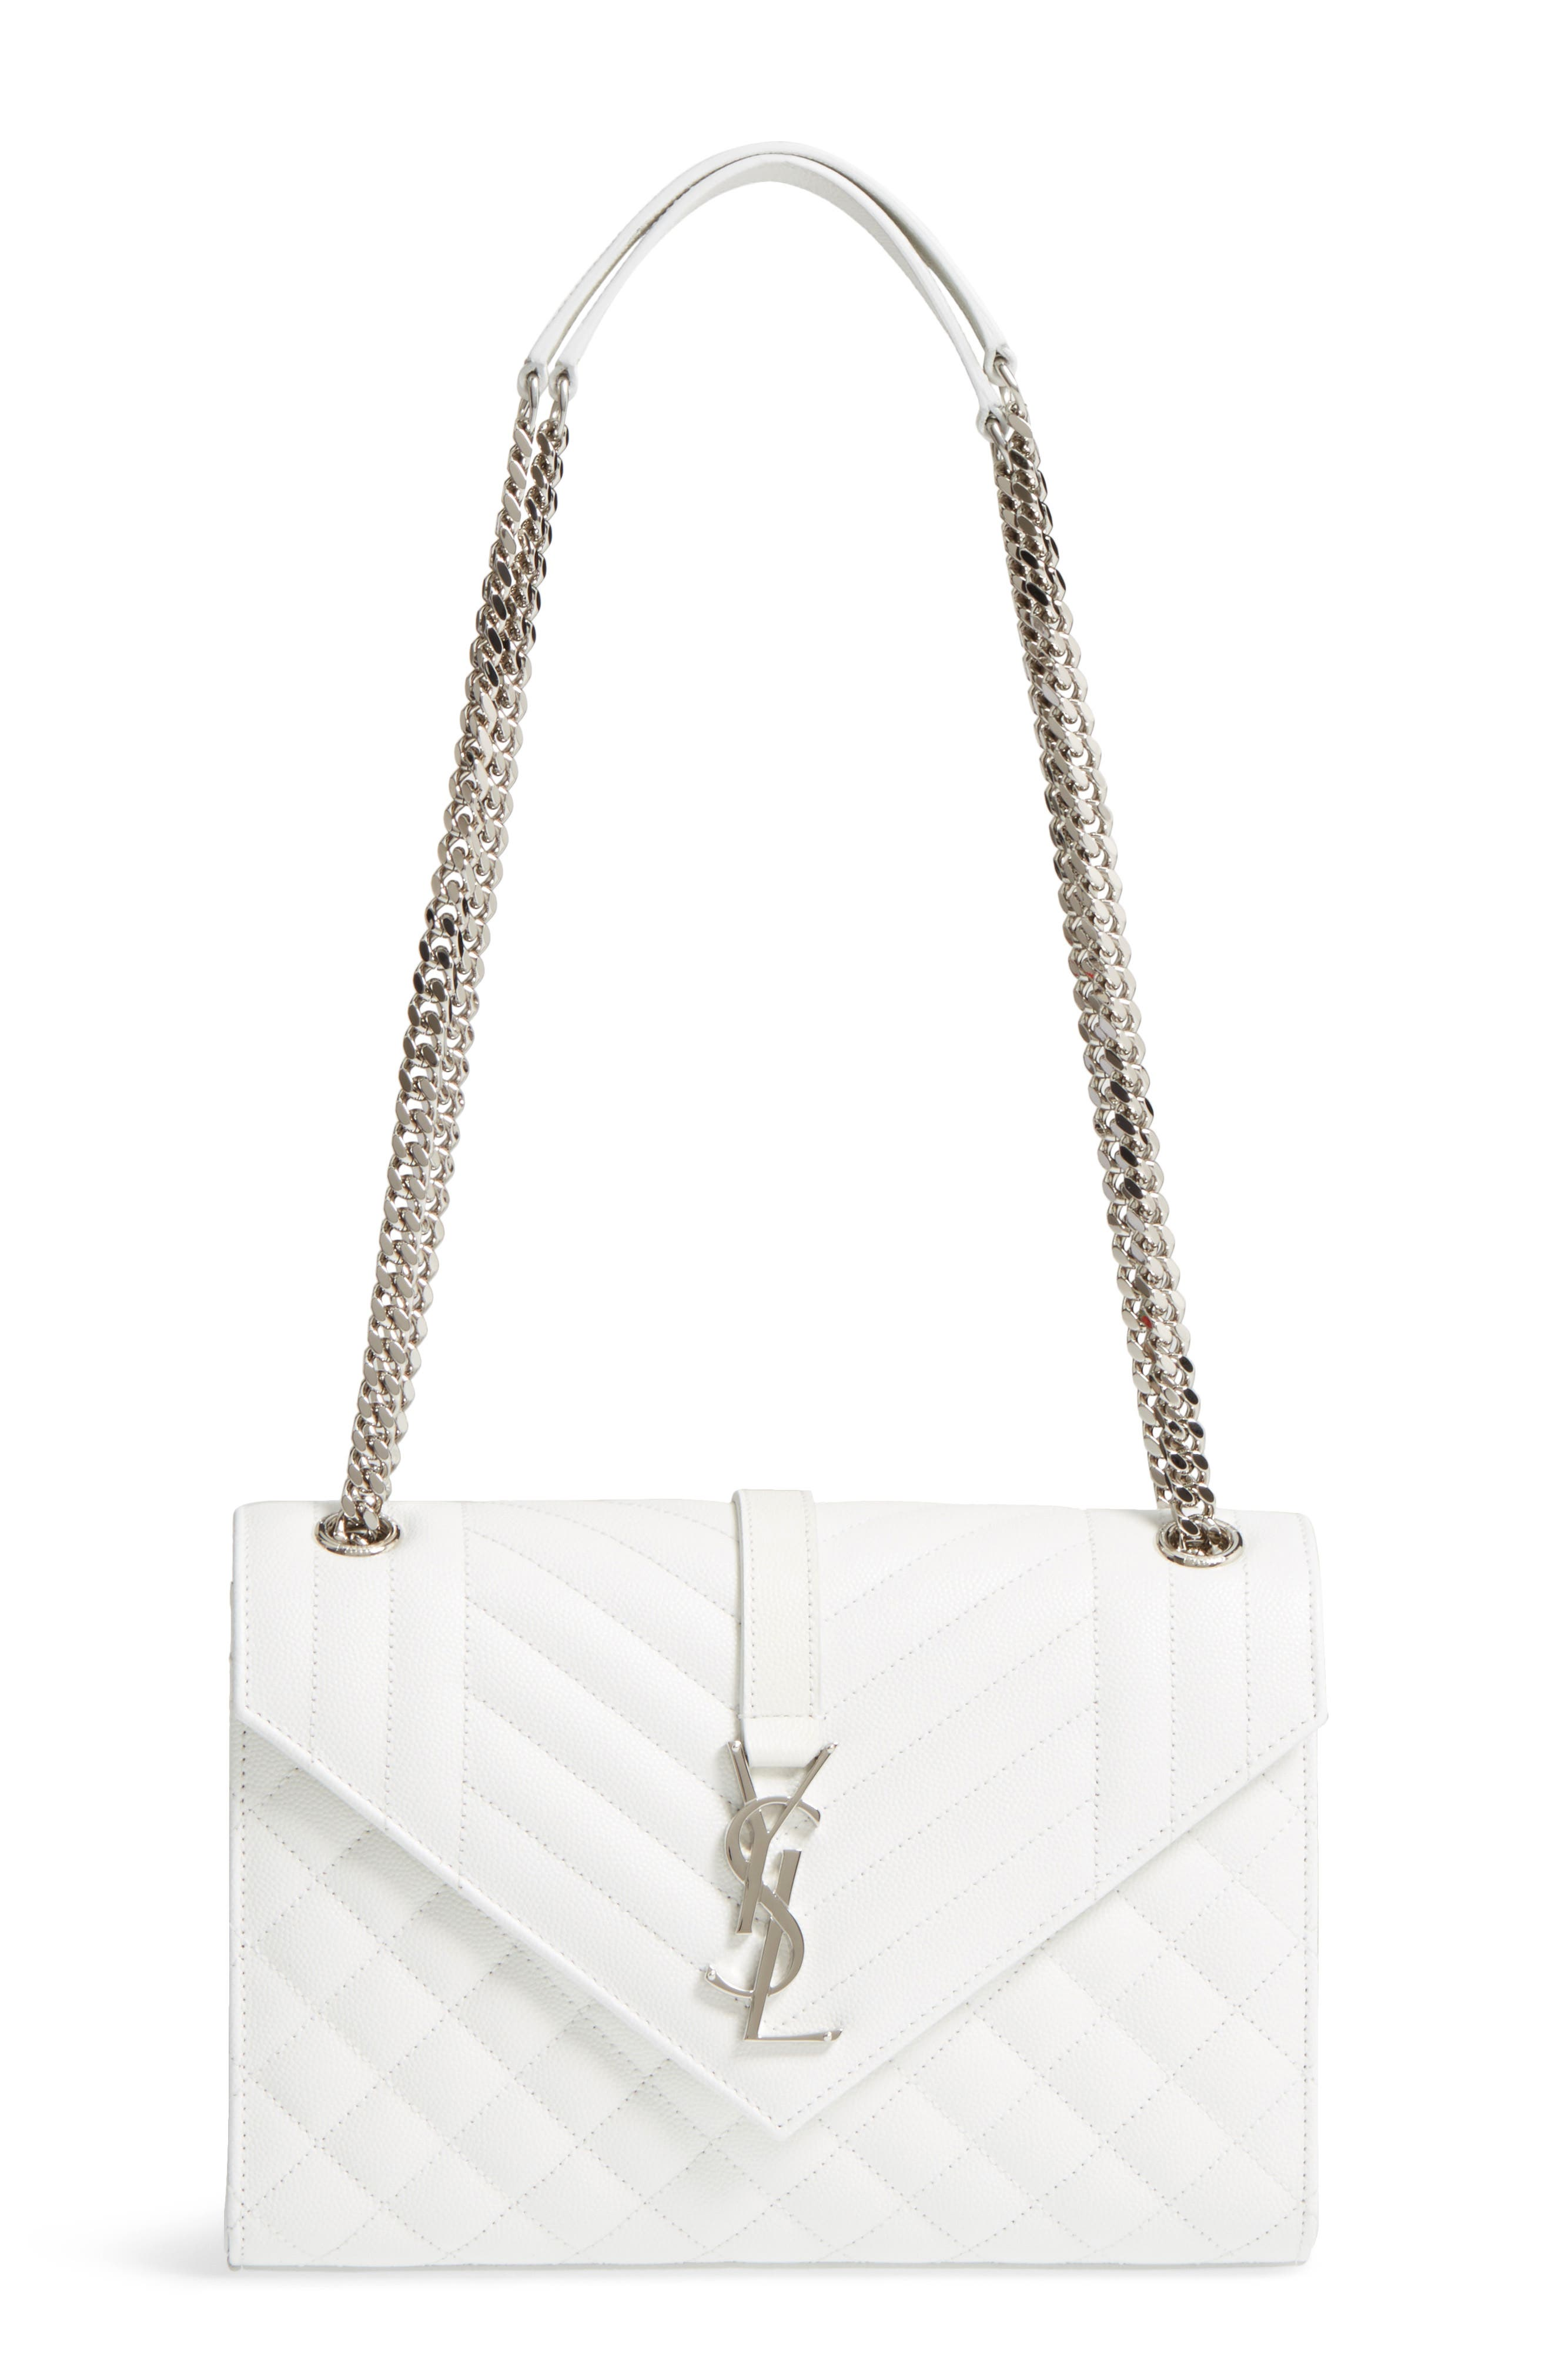 Main Image - Saint Laurent Medium Calfskin Shoulder Bag